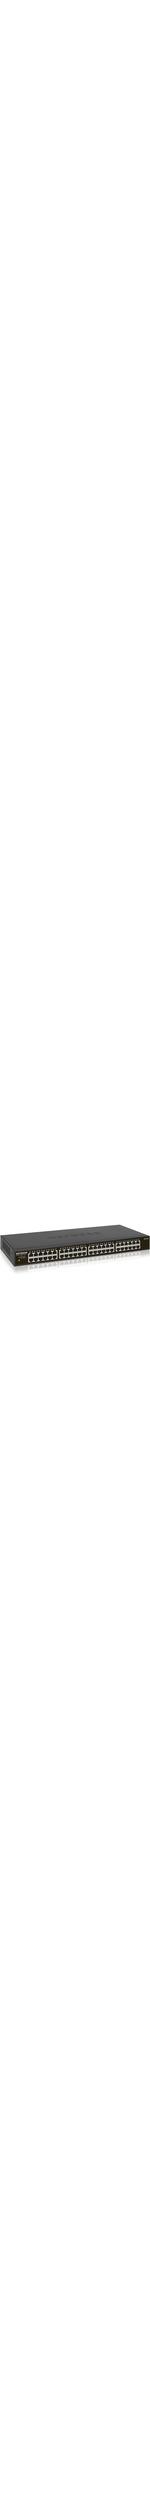 Netgear GS348 48 Ports Ethernet Switch